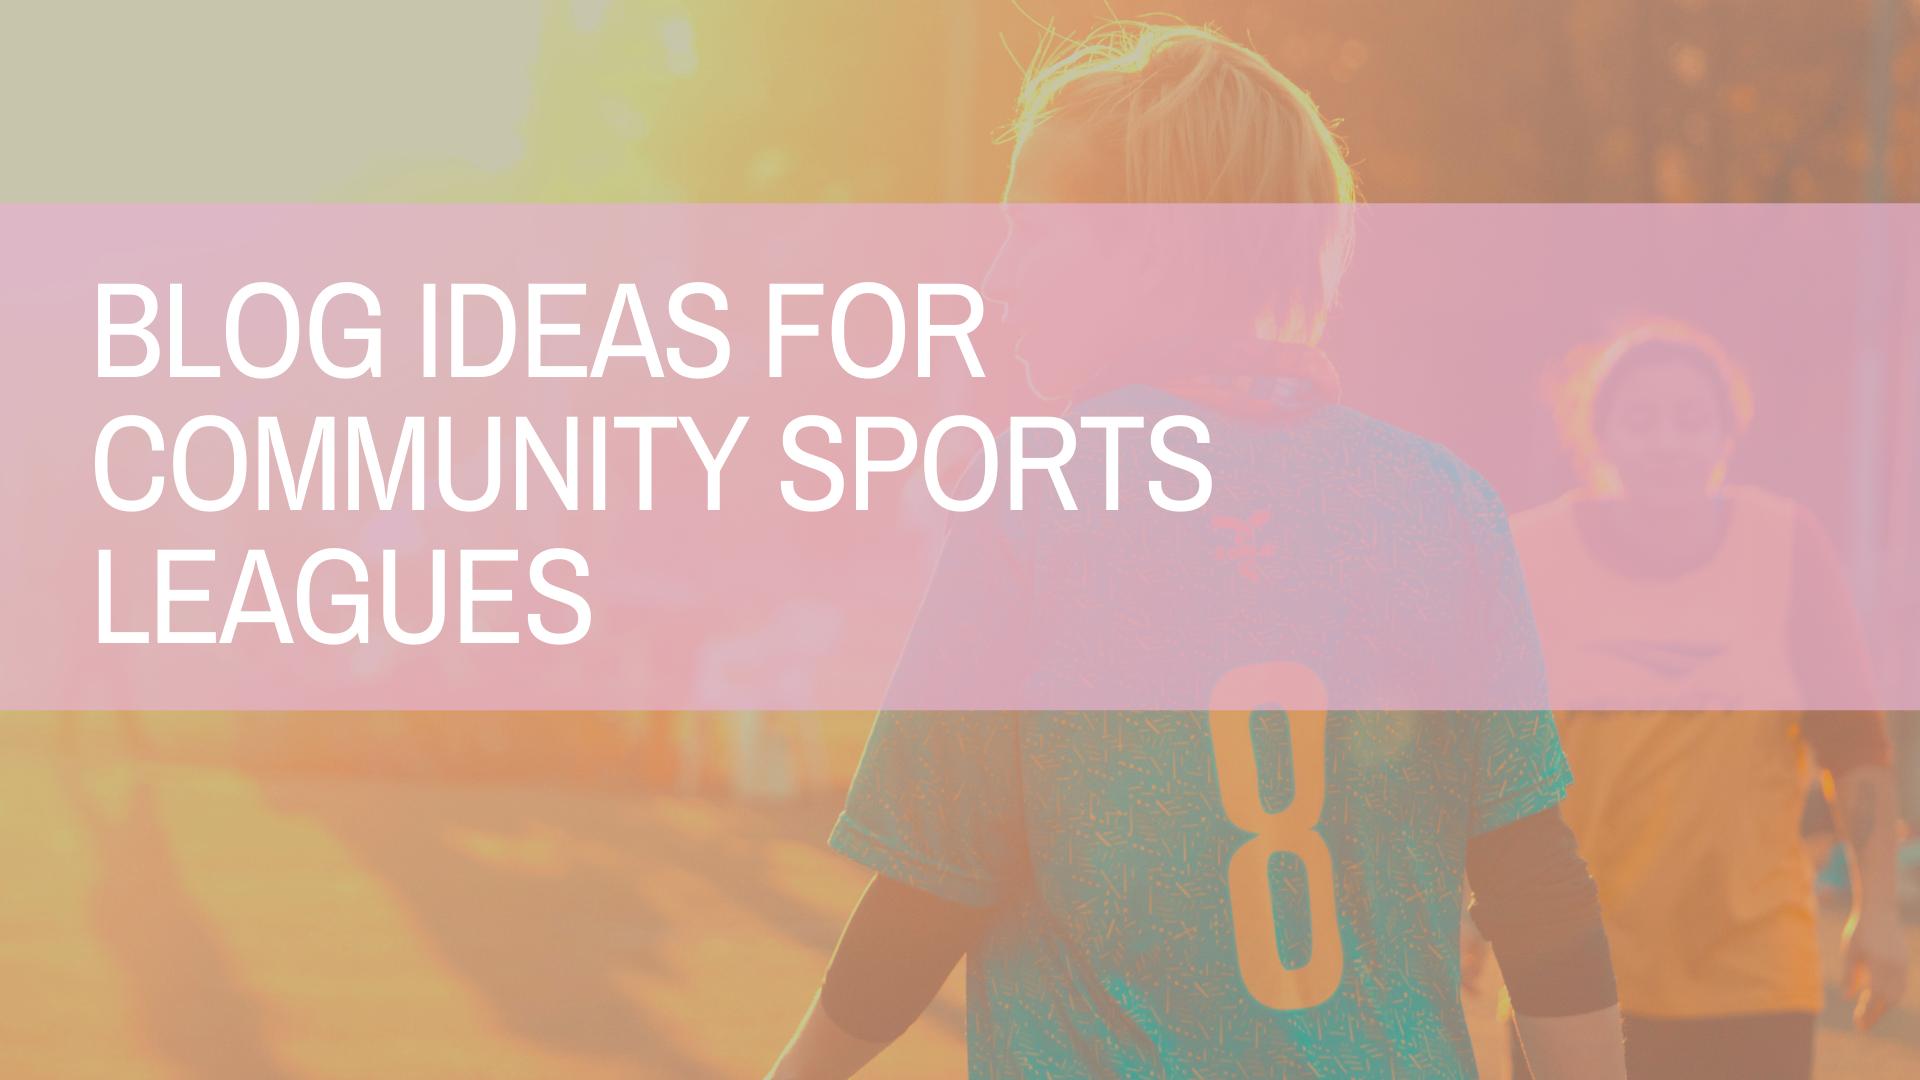 Blog Ideas for Community Sports Leagues